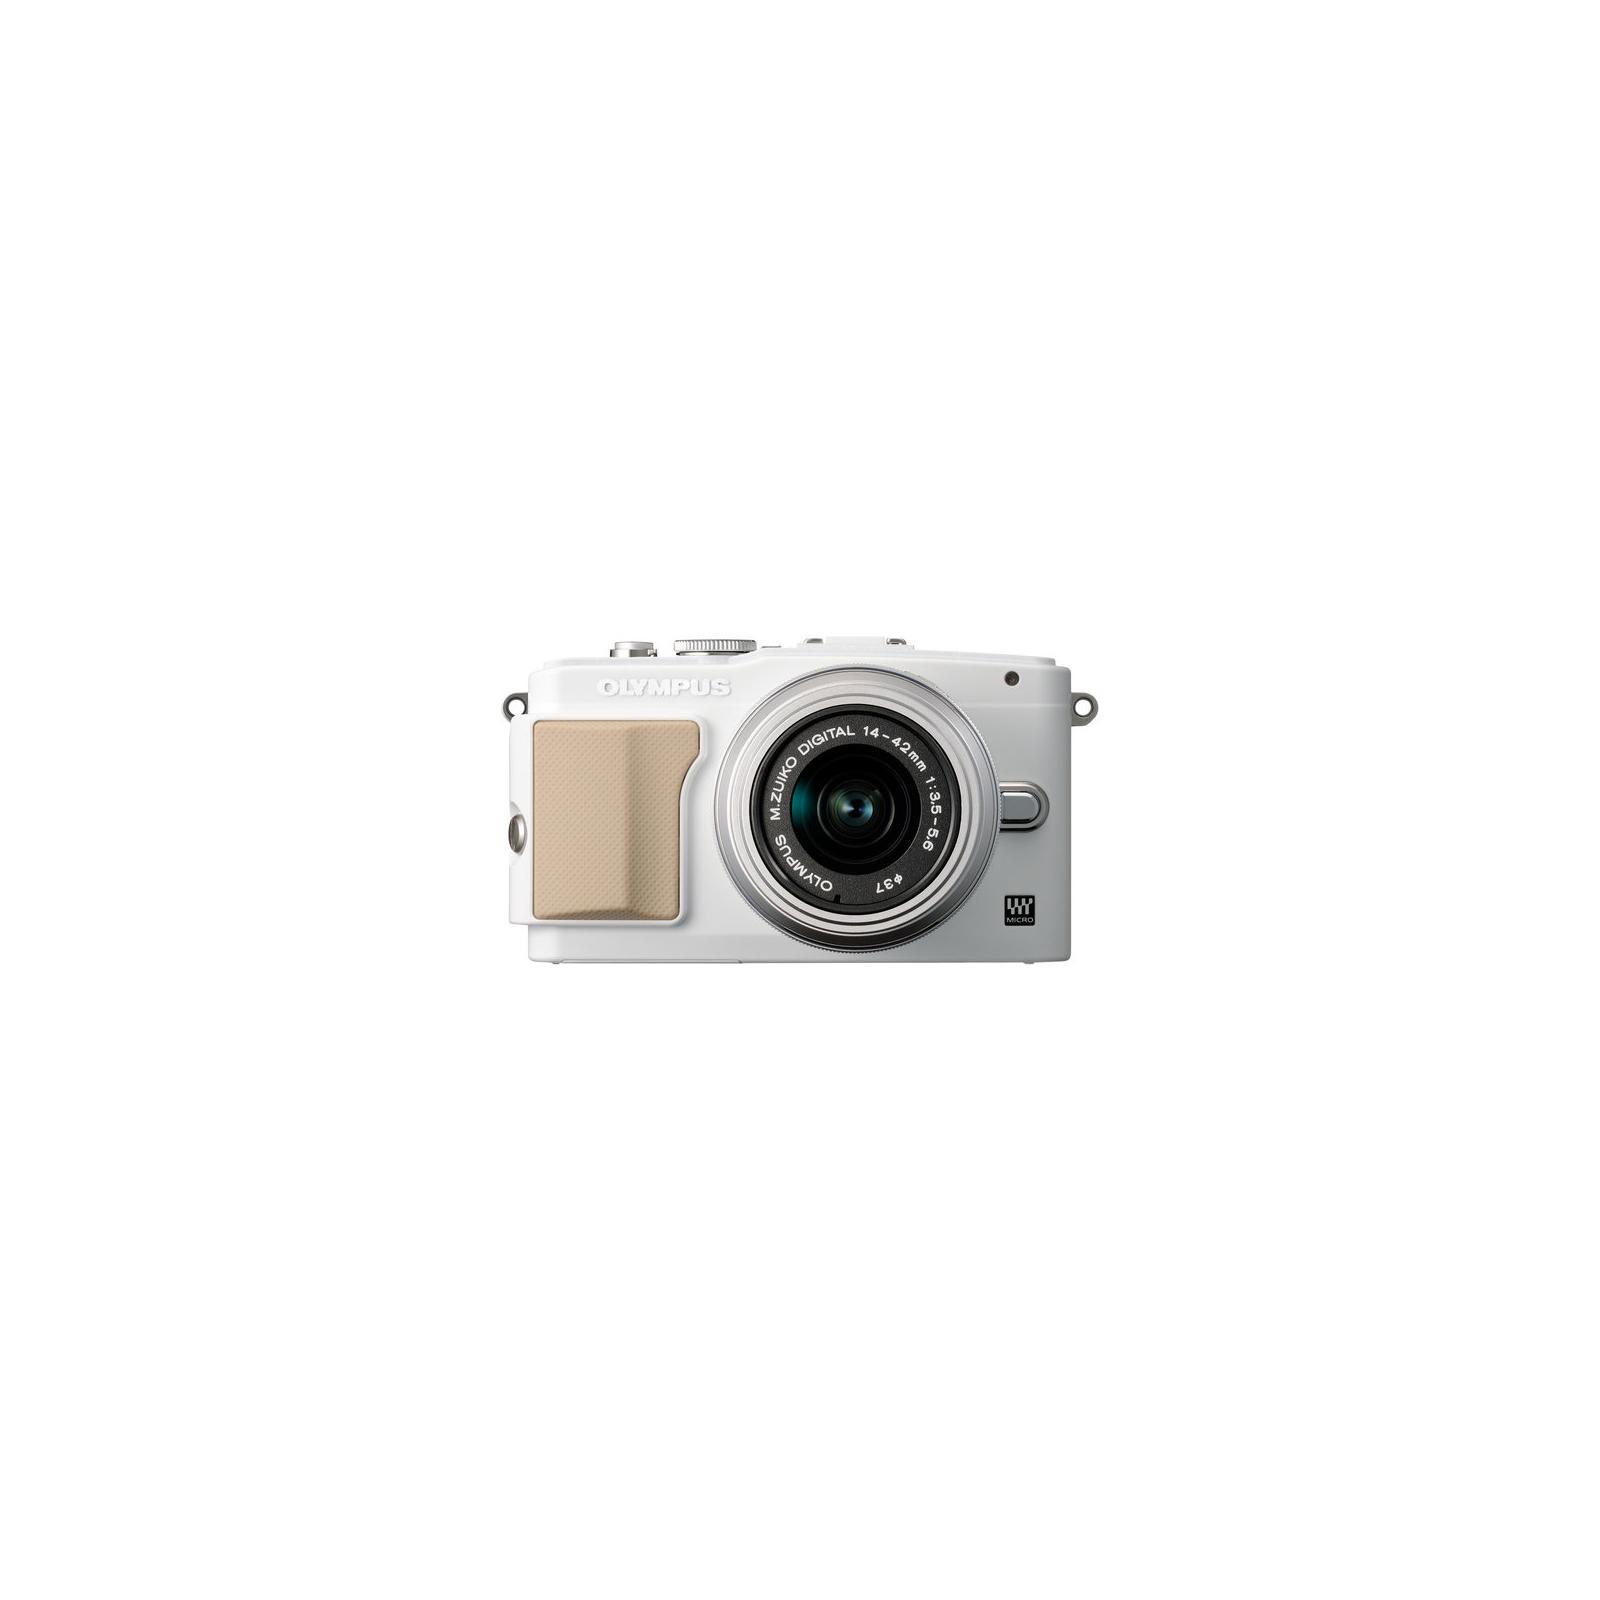 Цифровой фотоаппарат OLYMPUS E-PL5 14-42 mm white/silver (V205041WE000)